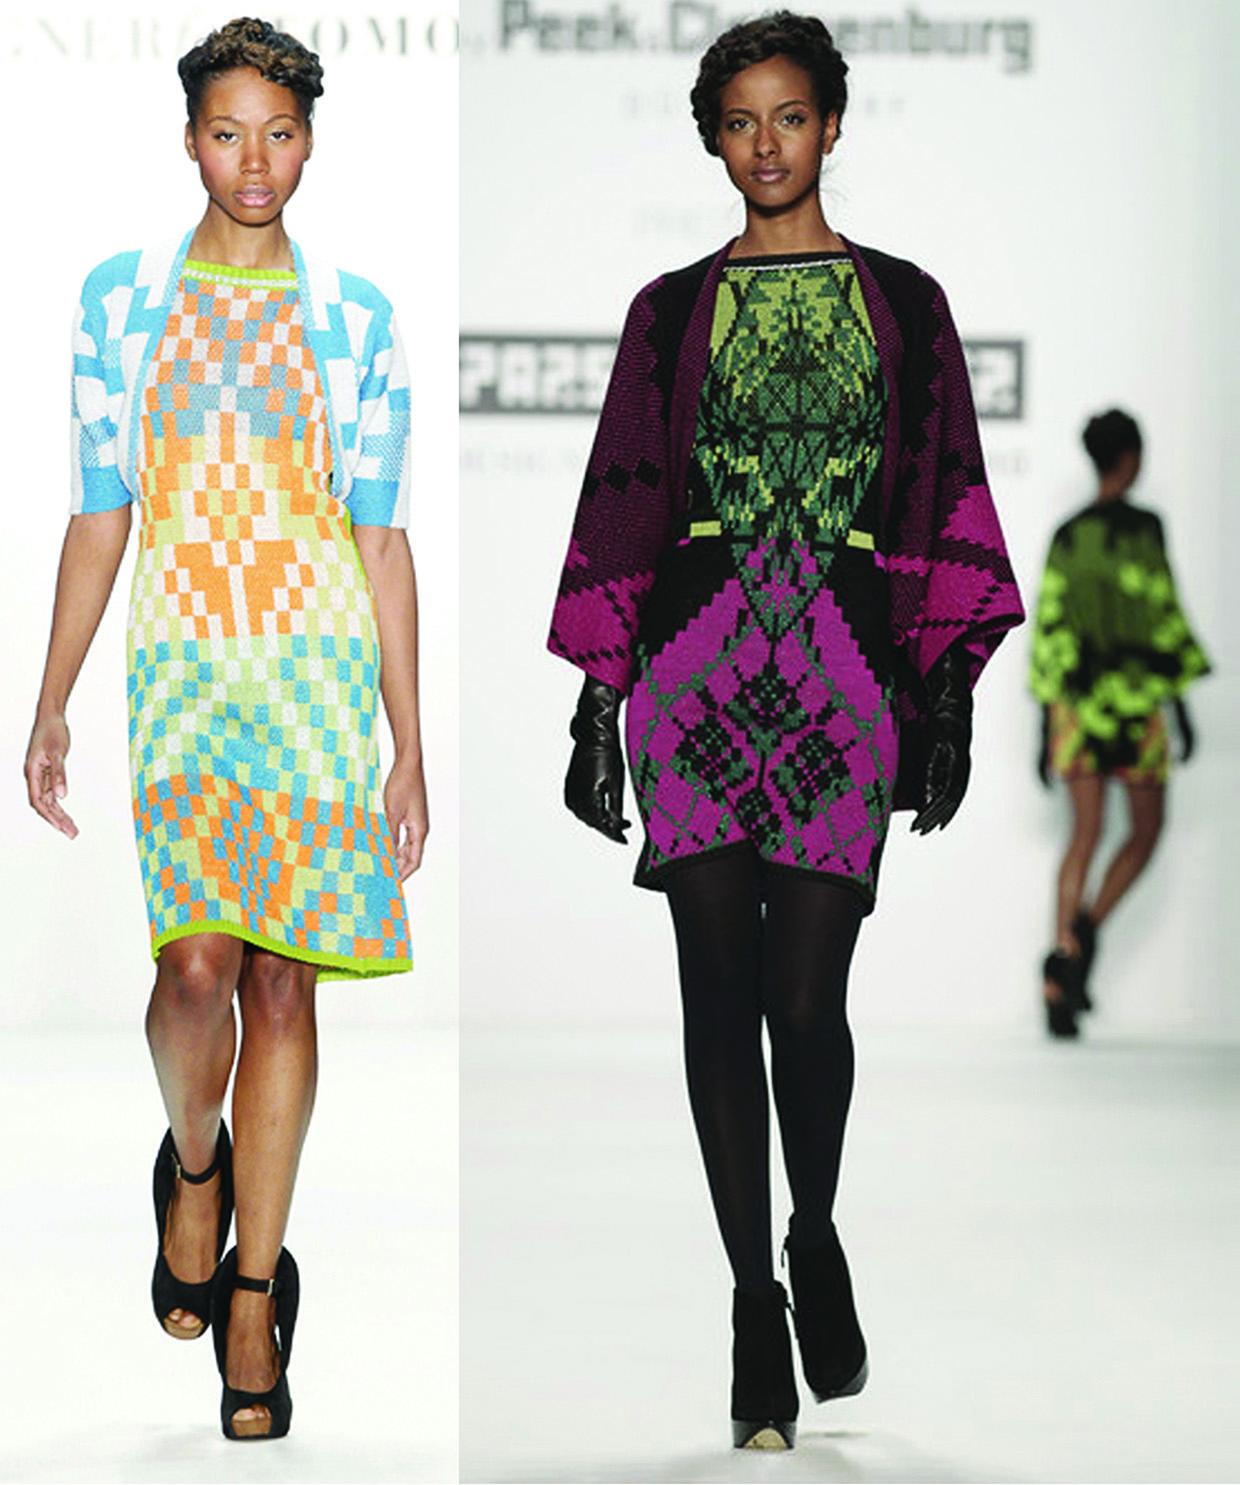 Katinka Saltzmann Shoes Design